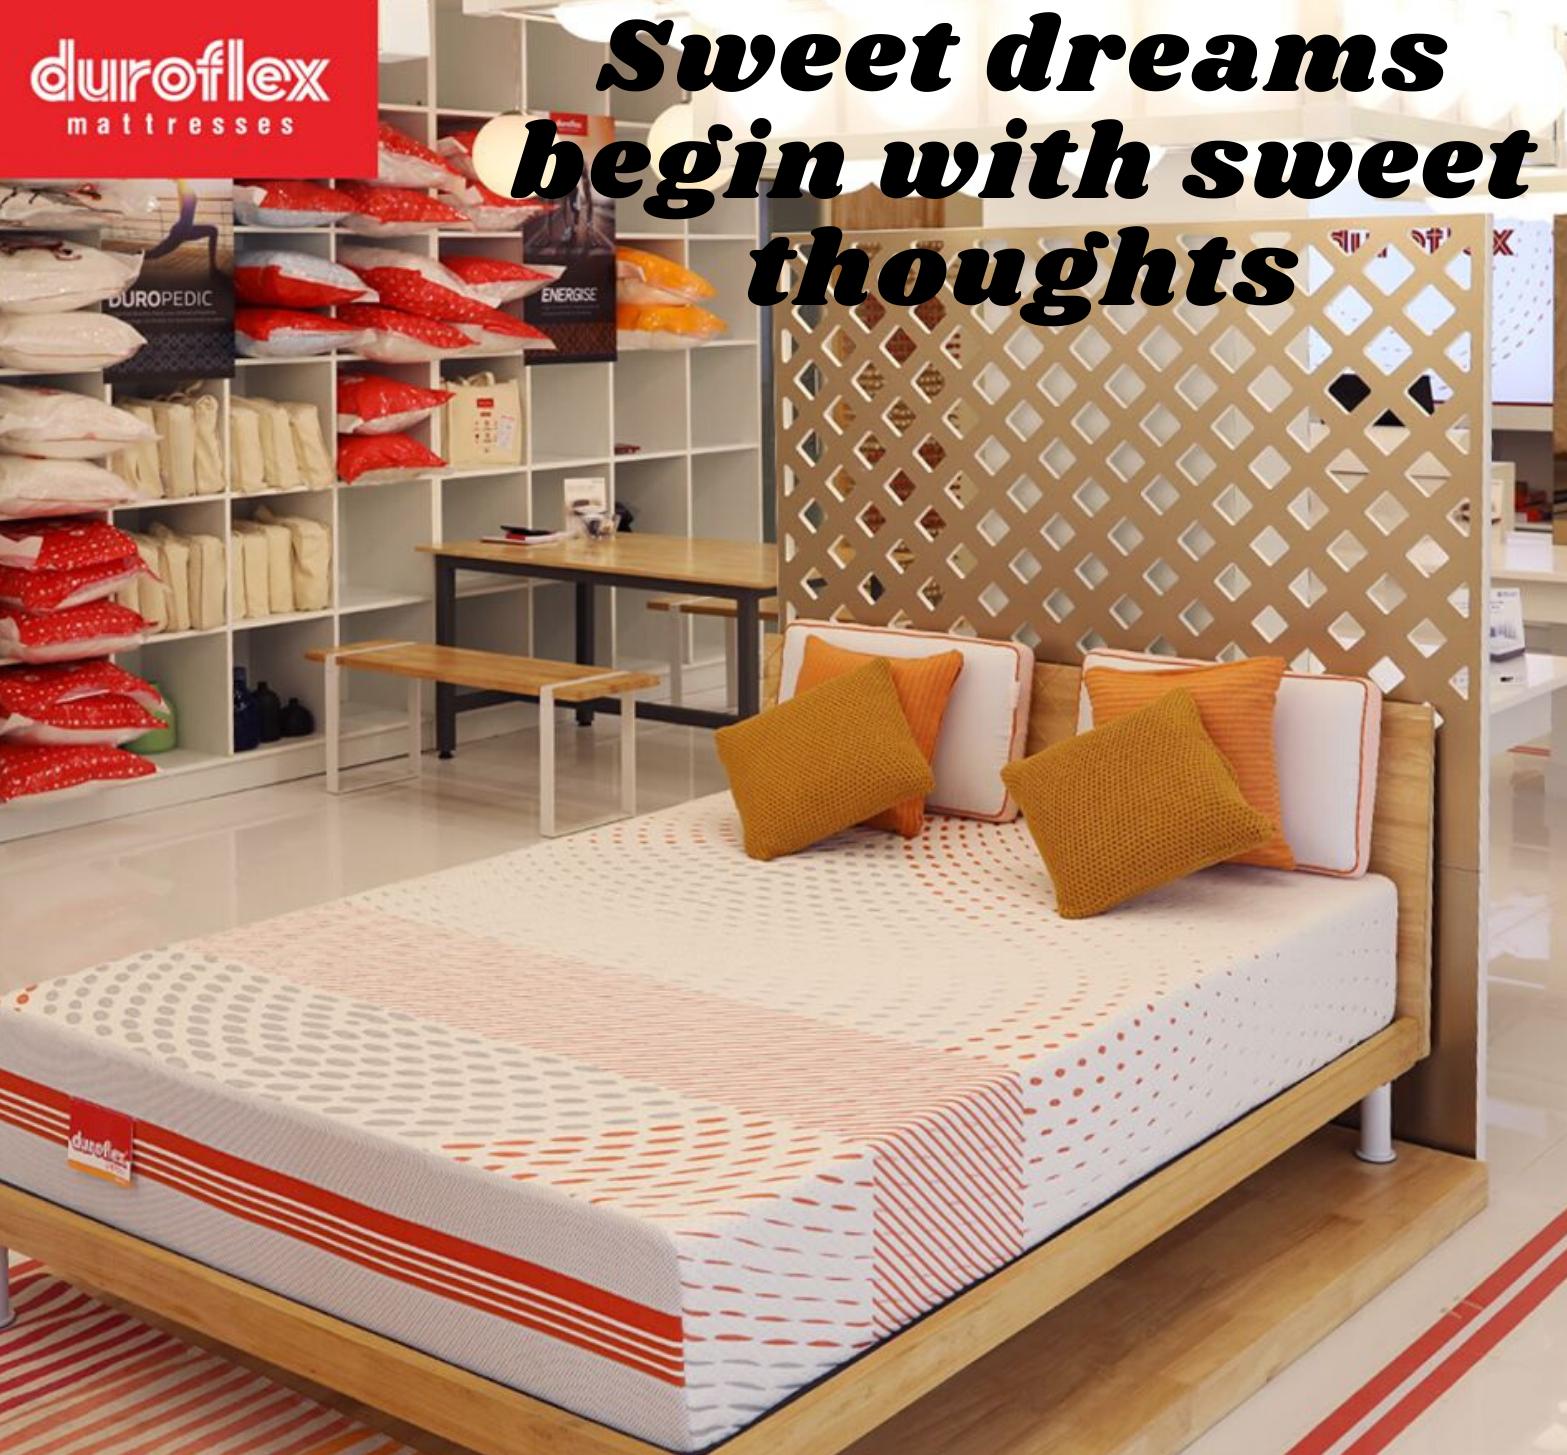 Best Furniture Store In Coimbatore City Coimbatore Furniture Store Mattress Cool Furniture Furniture Furniture Store